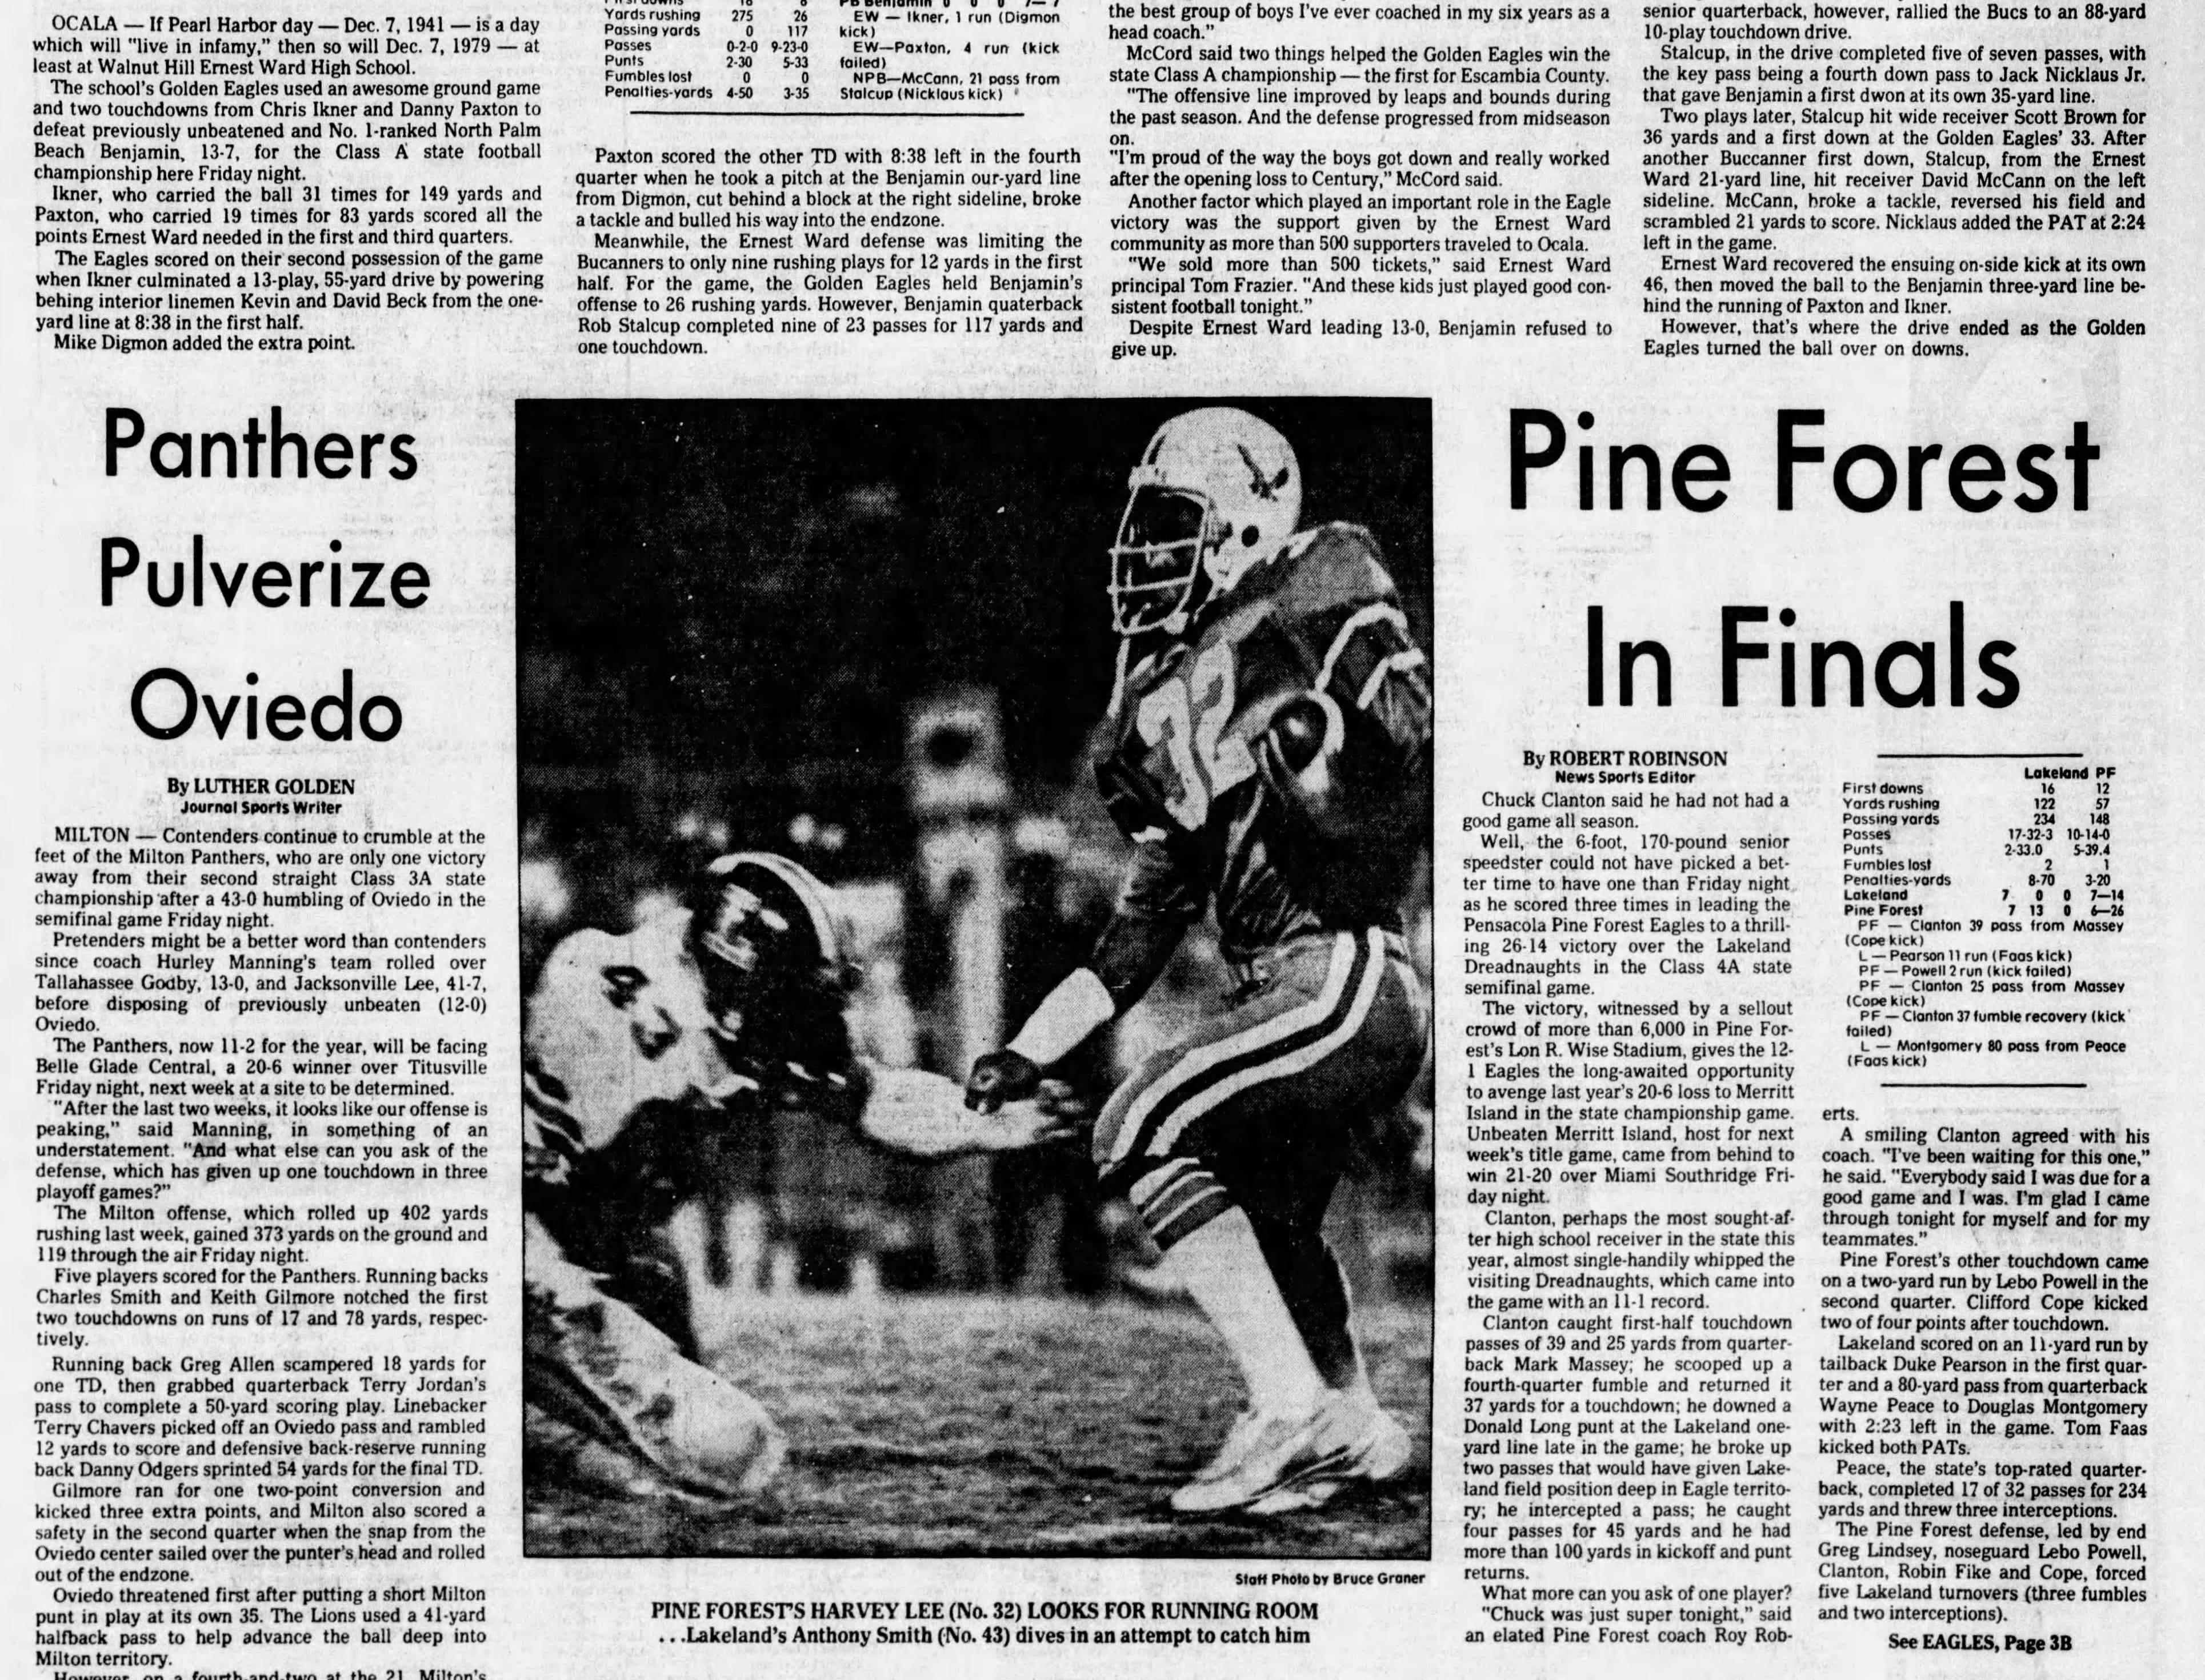 1979: Ernest Ward defeats Palm Beach Benjamin 13-7 for the Class A title.